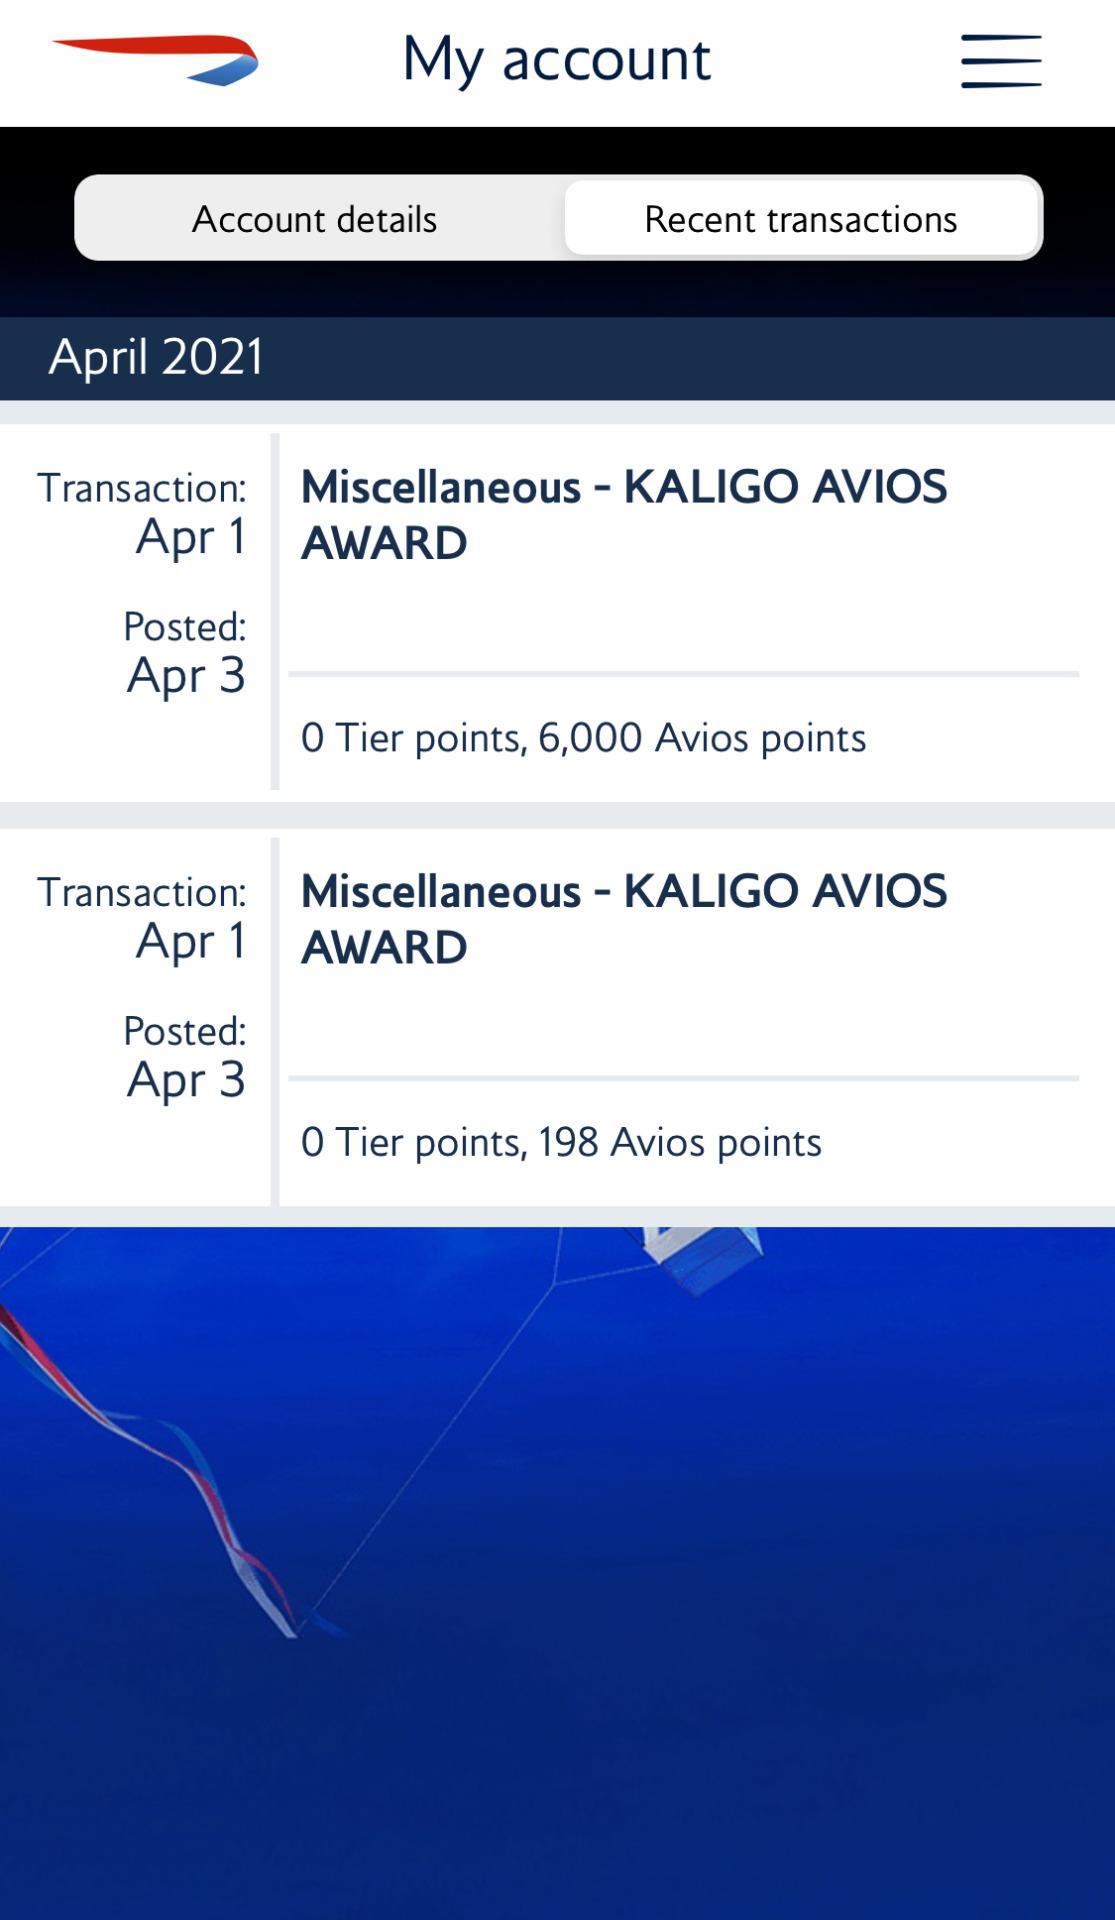 Kaligo経由予約の宿泊完了後にマイルが付与されるスケジュール